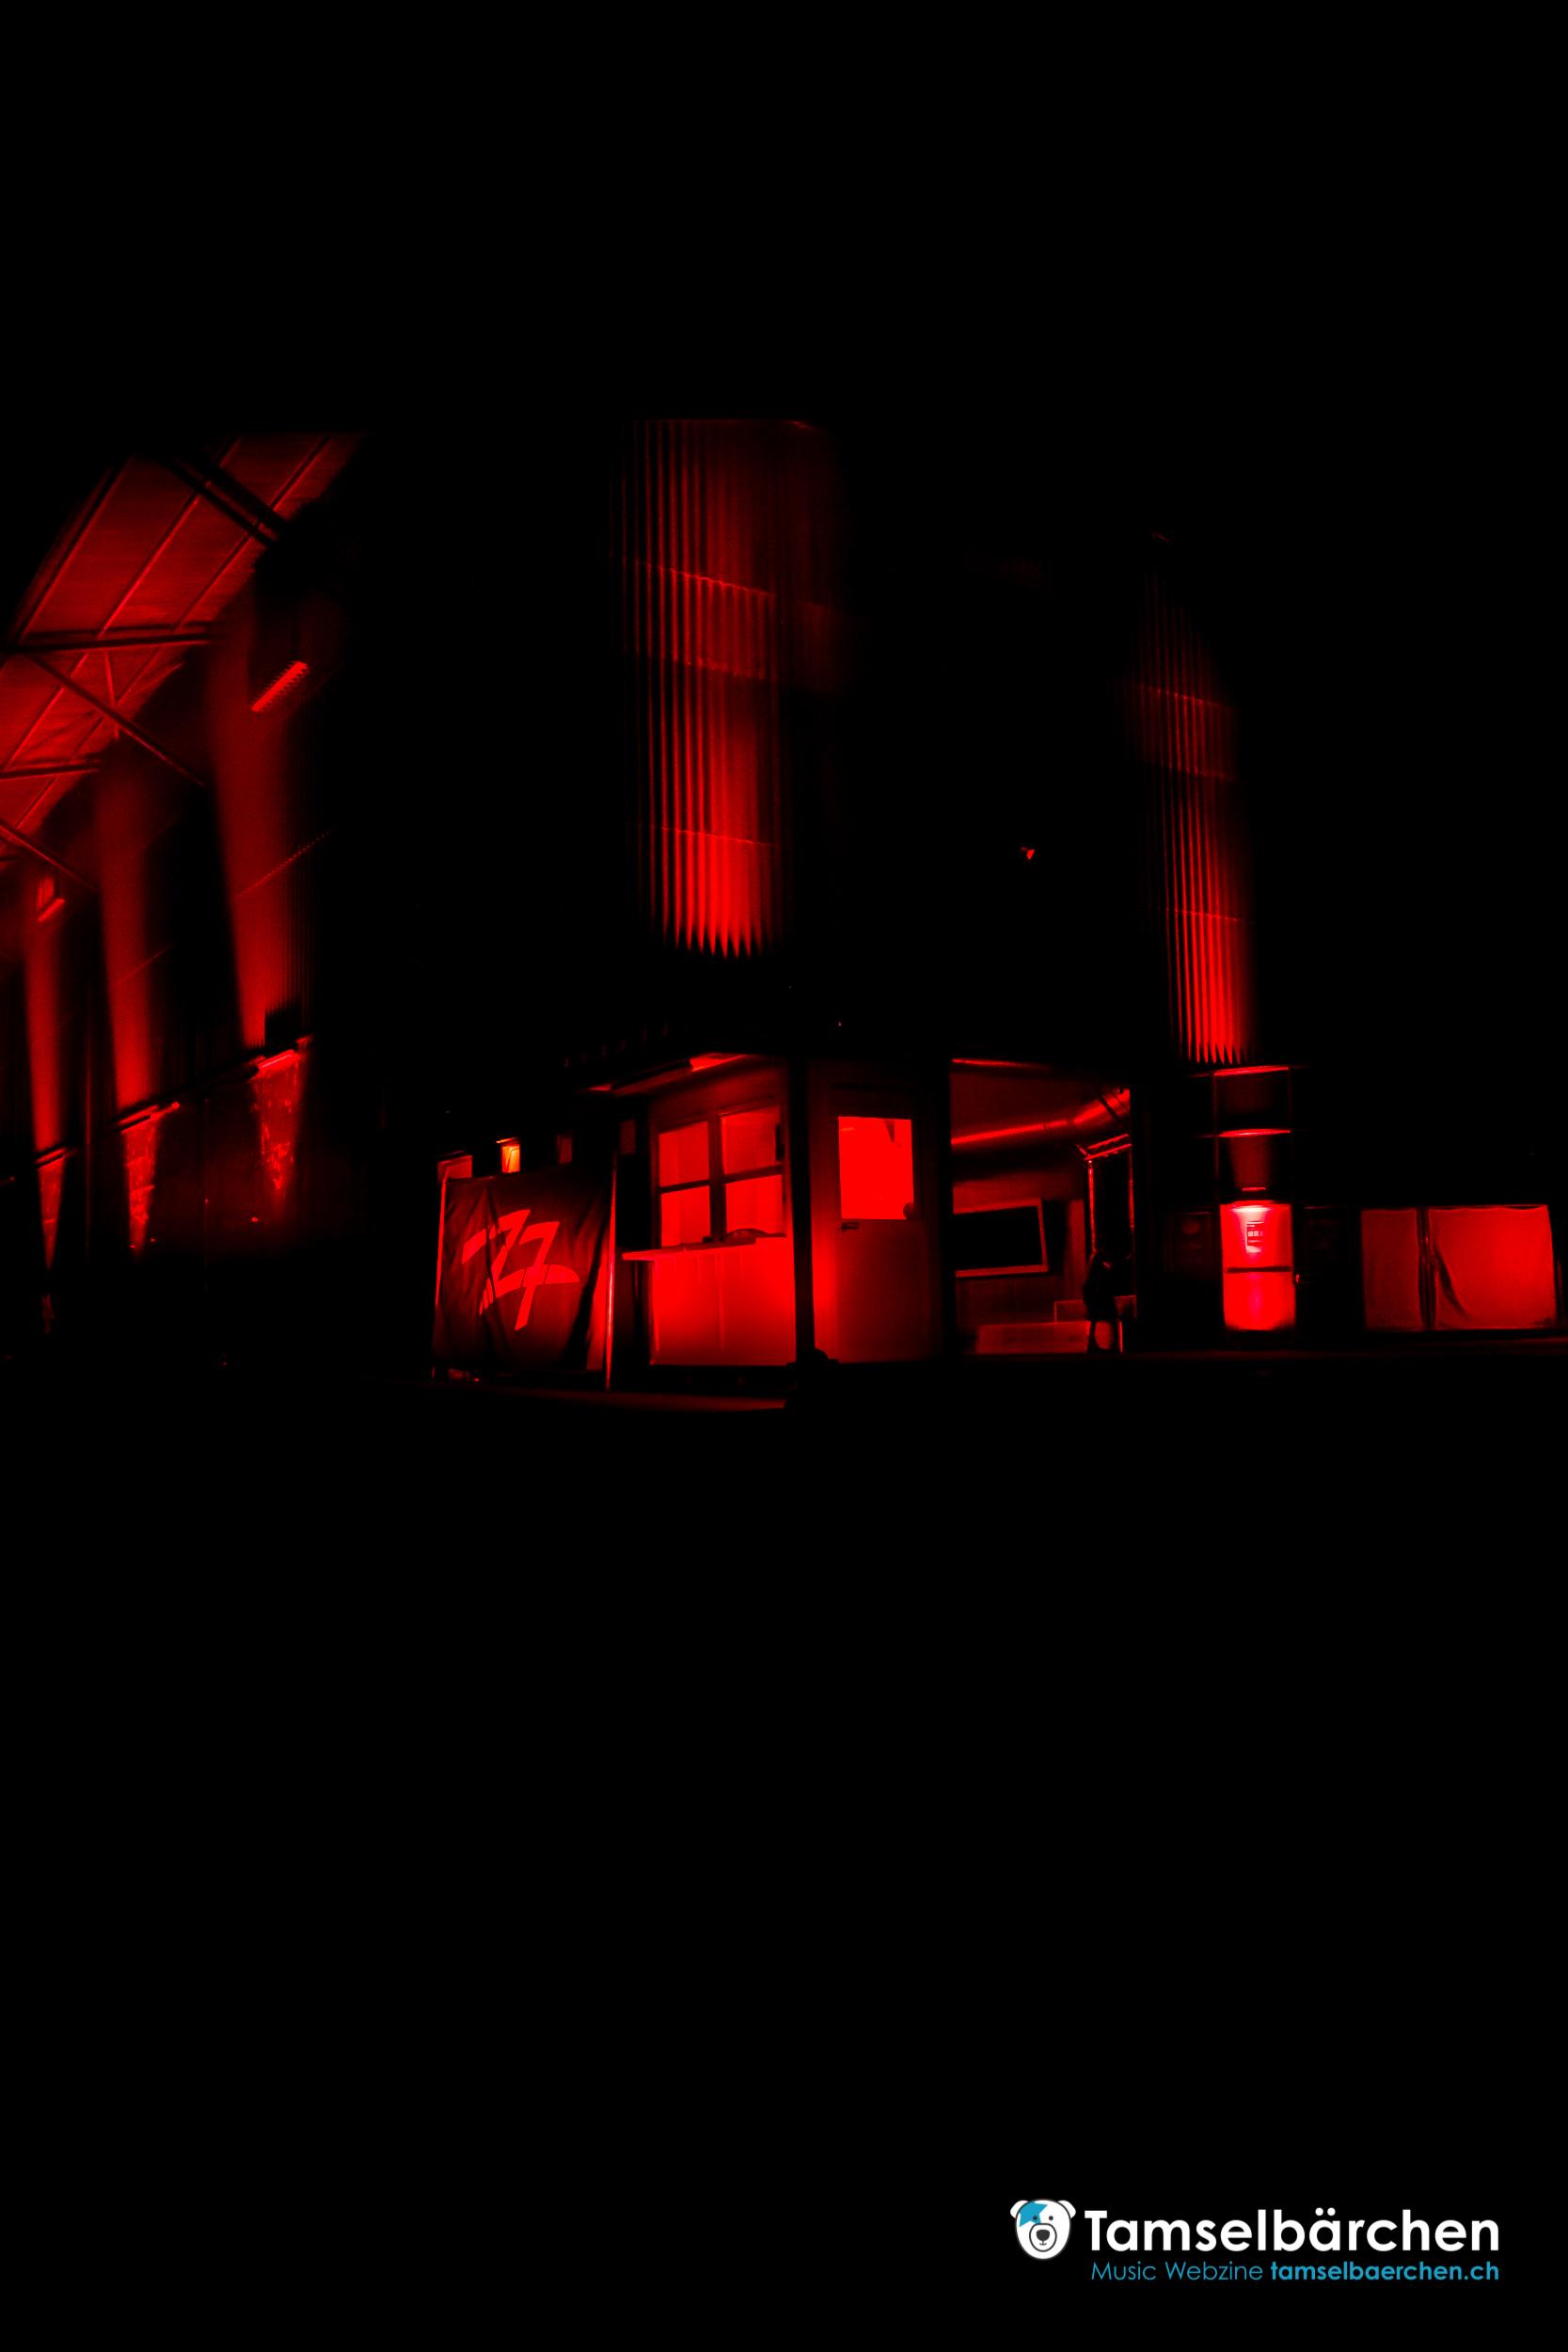 tamselbaerchen-nightoflight-4